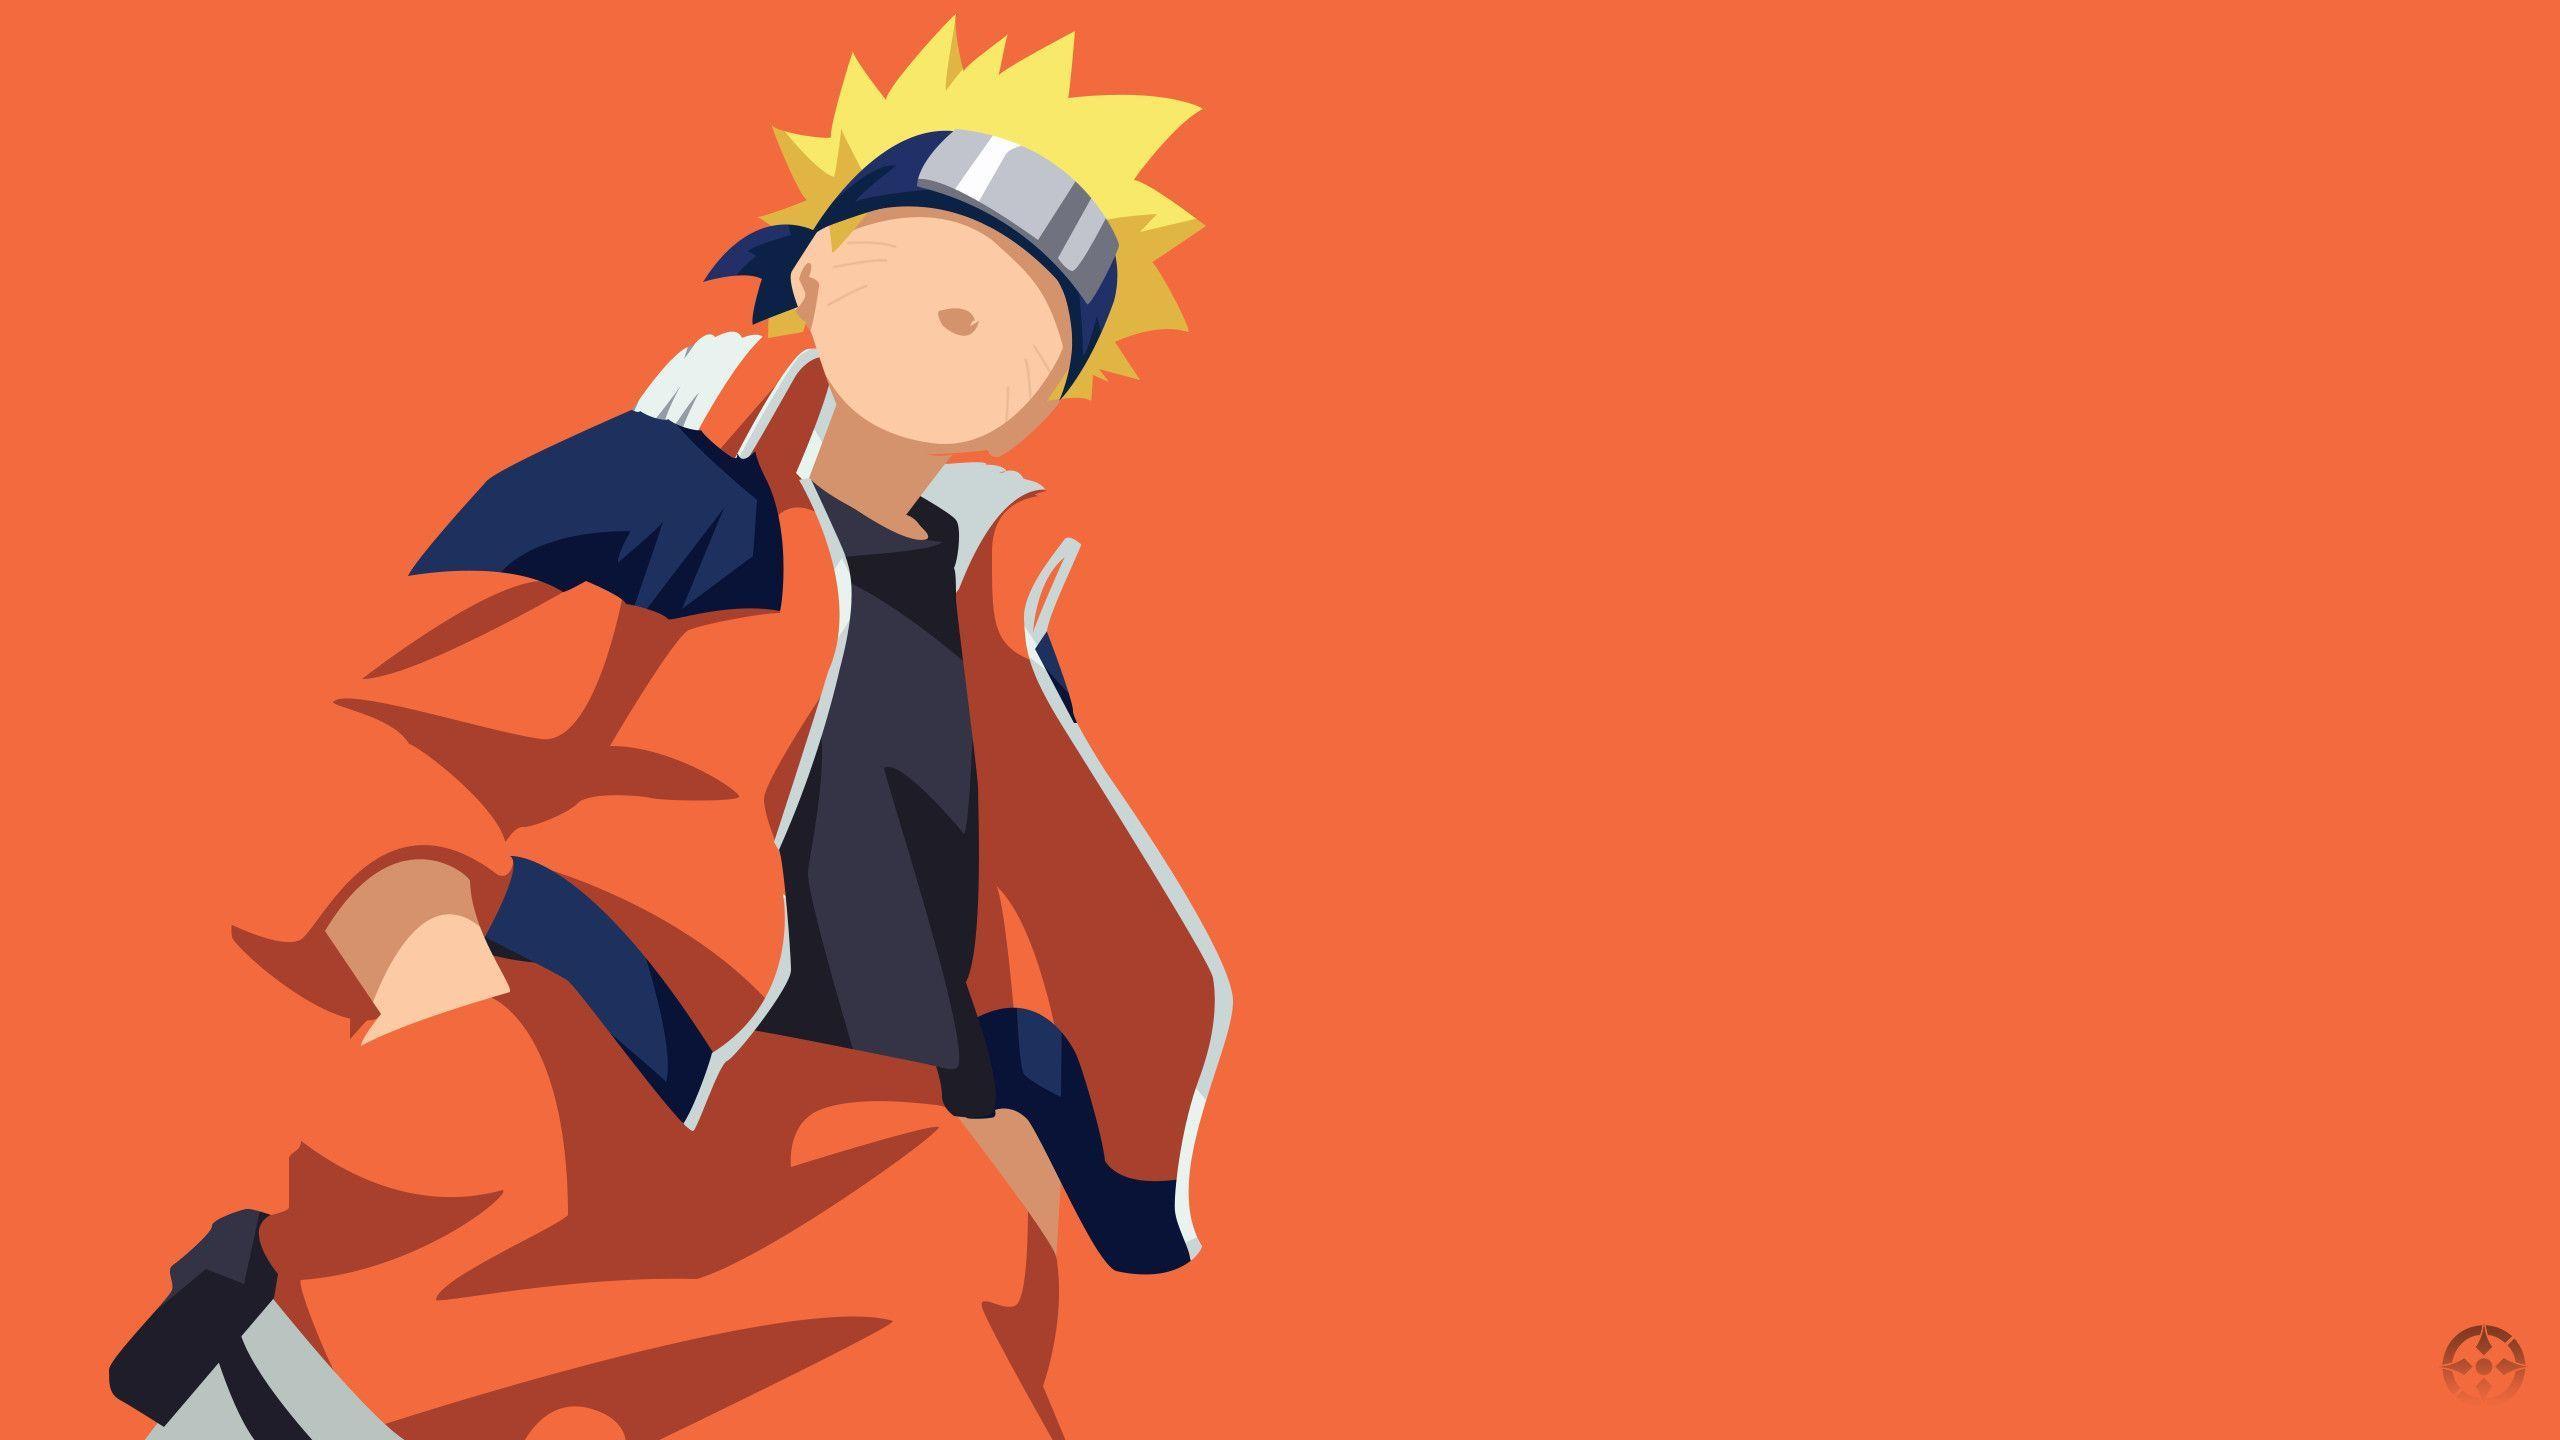 Kid Naruto Wallpapers Top Free Kid Naruto Backgrounds Wallpaperaccess